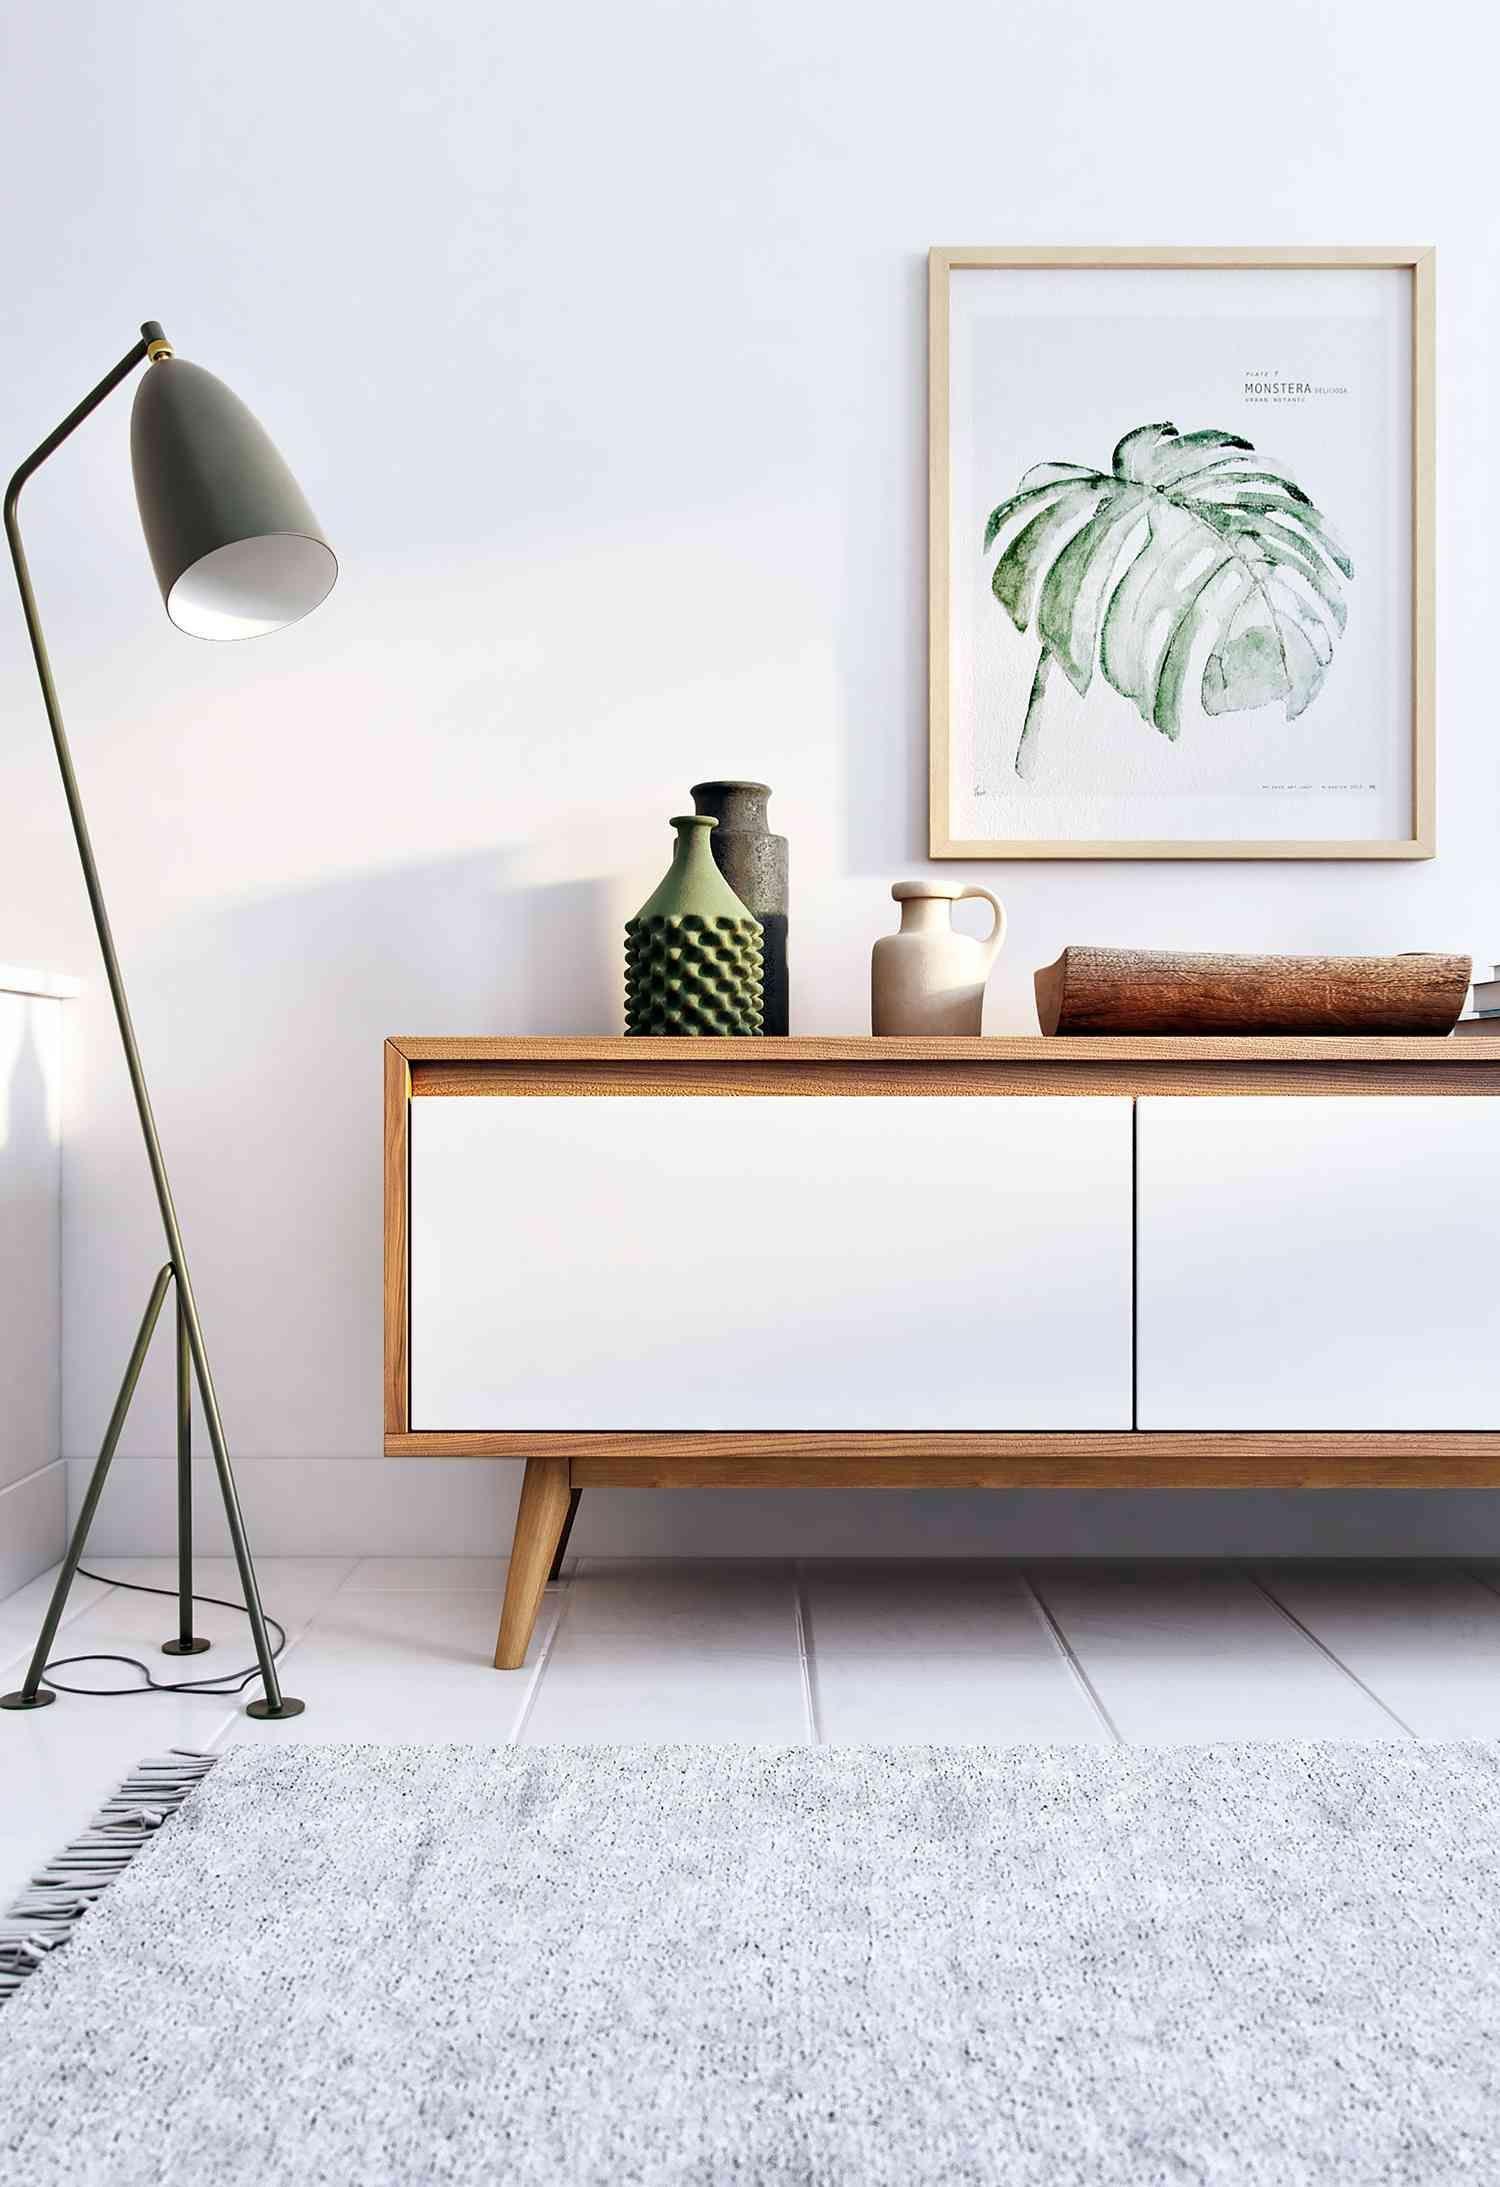 Modern Wood Tv Stand Showcase Design: 50+ Mid Century Modern Living Room Design Ideas 2019